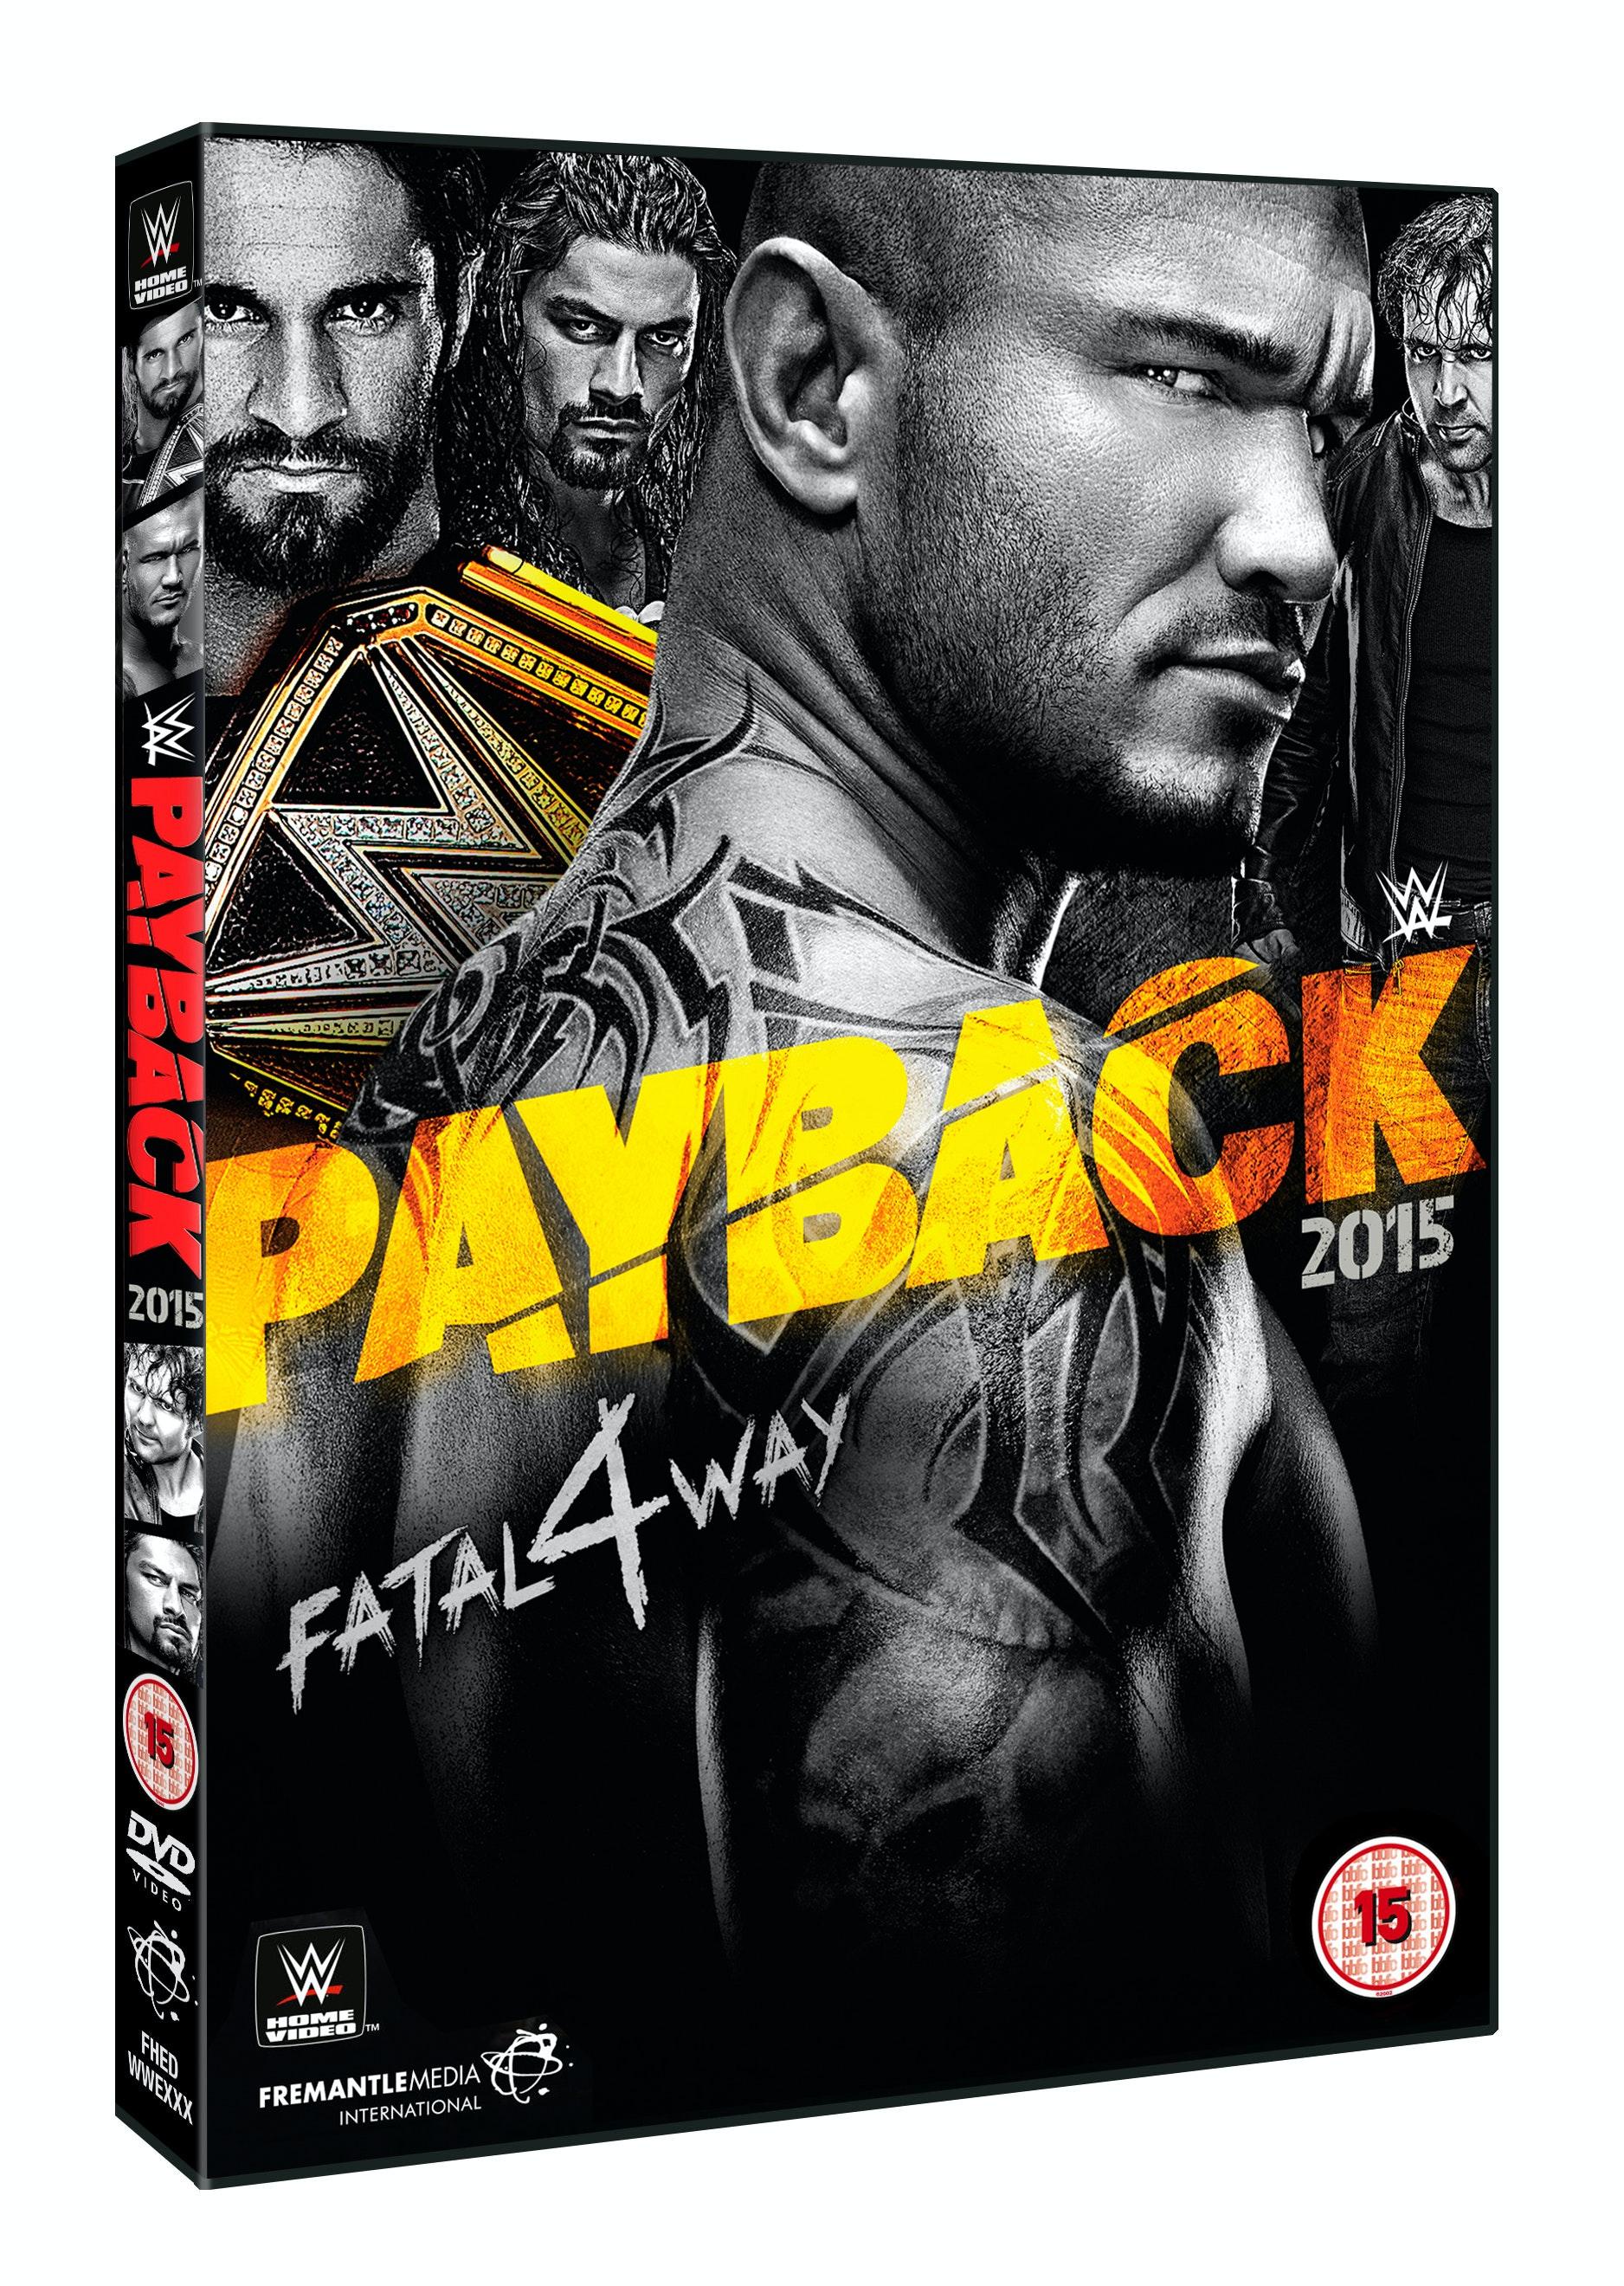 WWE Payback 2015 DVD sweepstakes